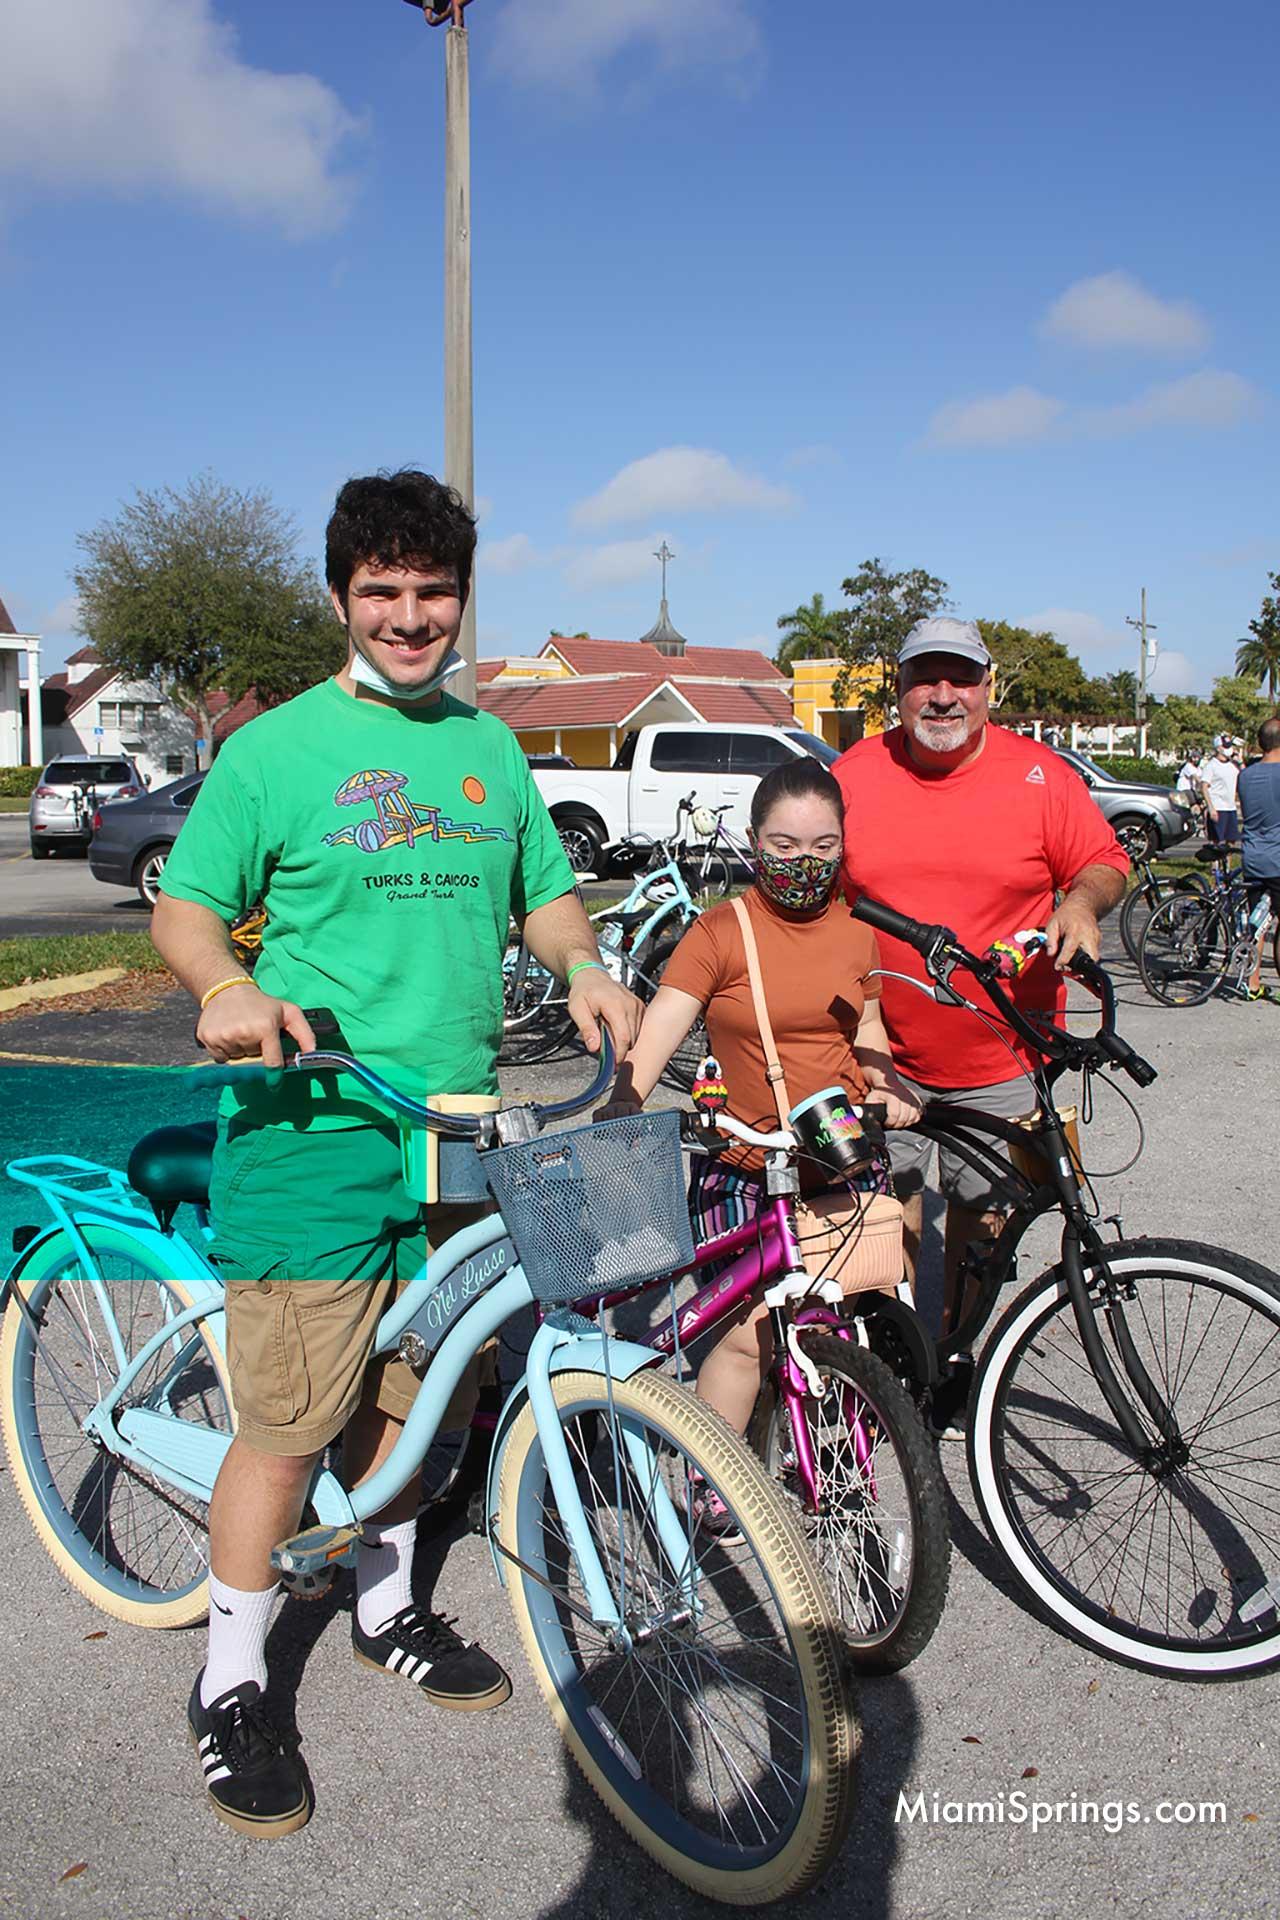 Varela Family at the 2021 Blessed Trinity Bike Ride through Miami Springs